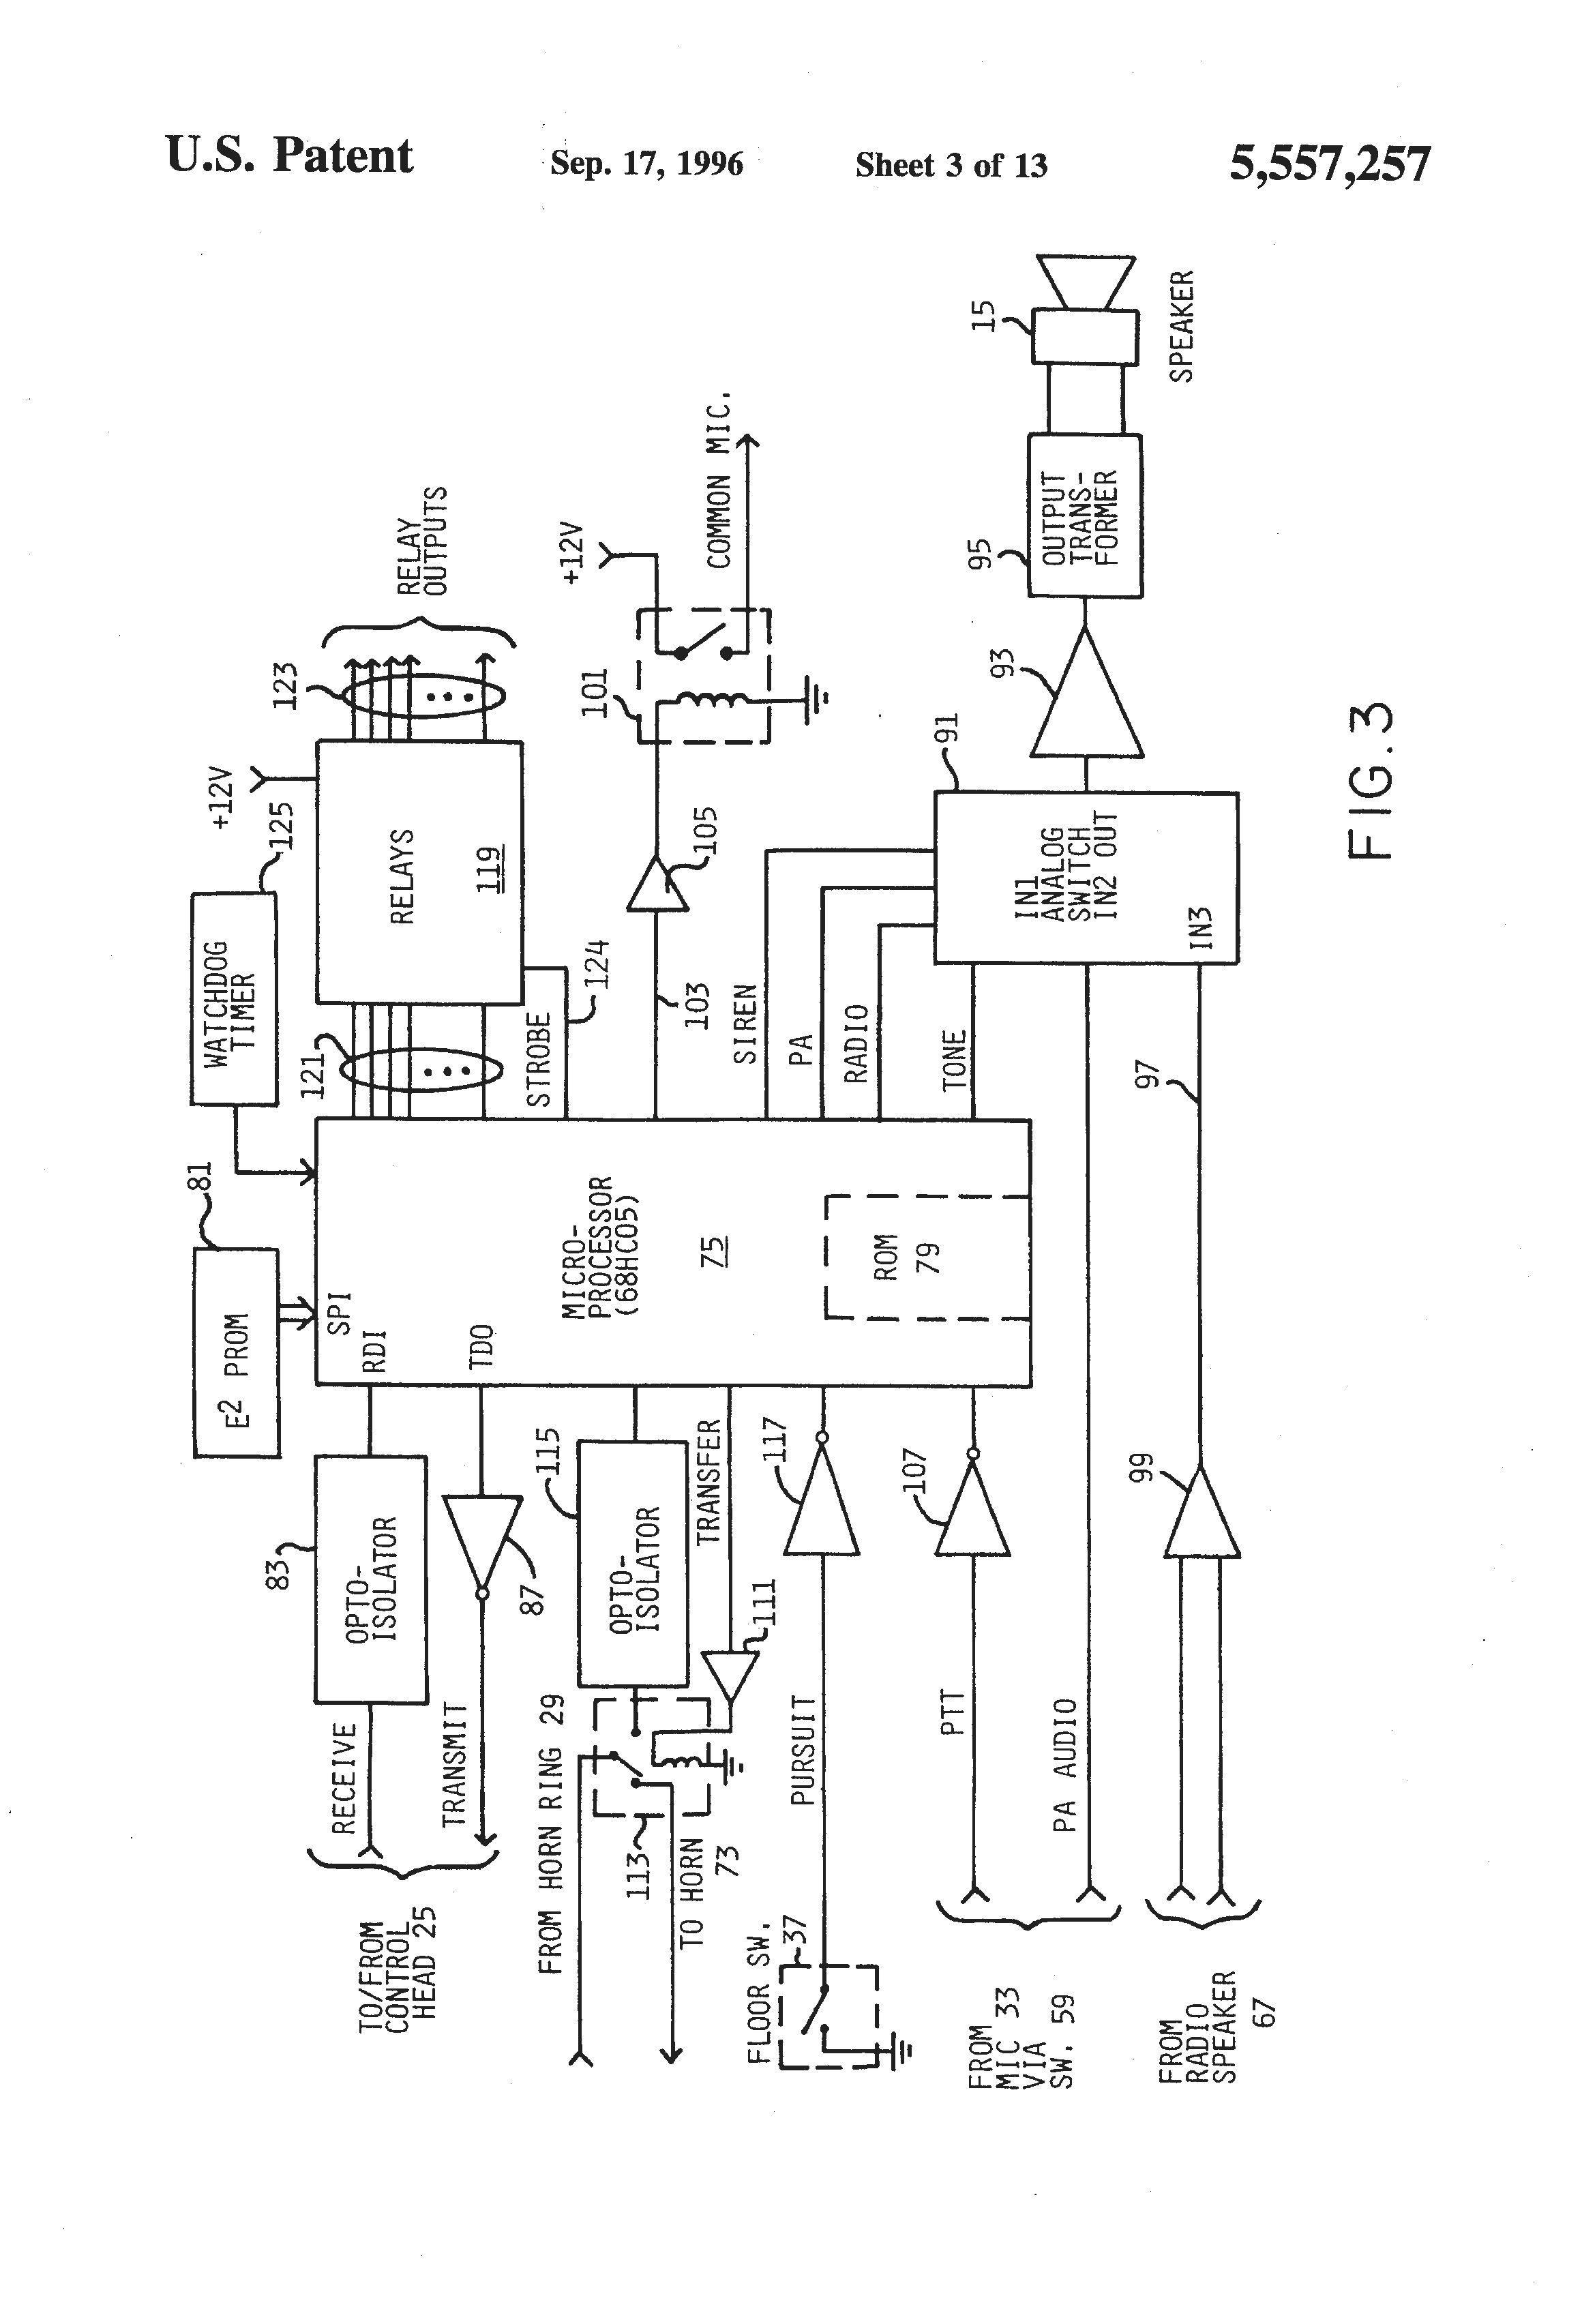 [TVPR_3874]  17 Good Federal Signal Legend Lightbar Wiring Diagram Ideas | Diagram, Bar  lighting, Led warning lights | Federal Signal Lightbar Wiring Diagram |  | Pinterest